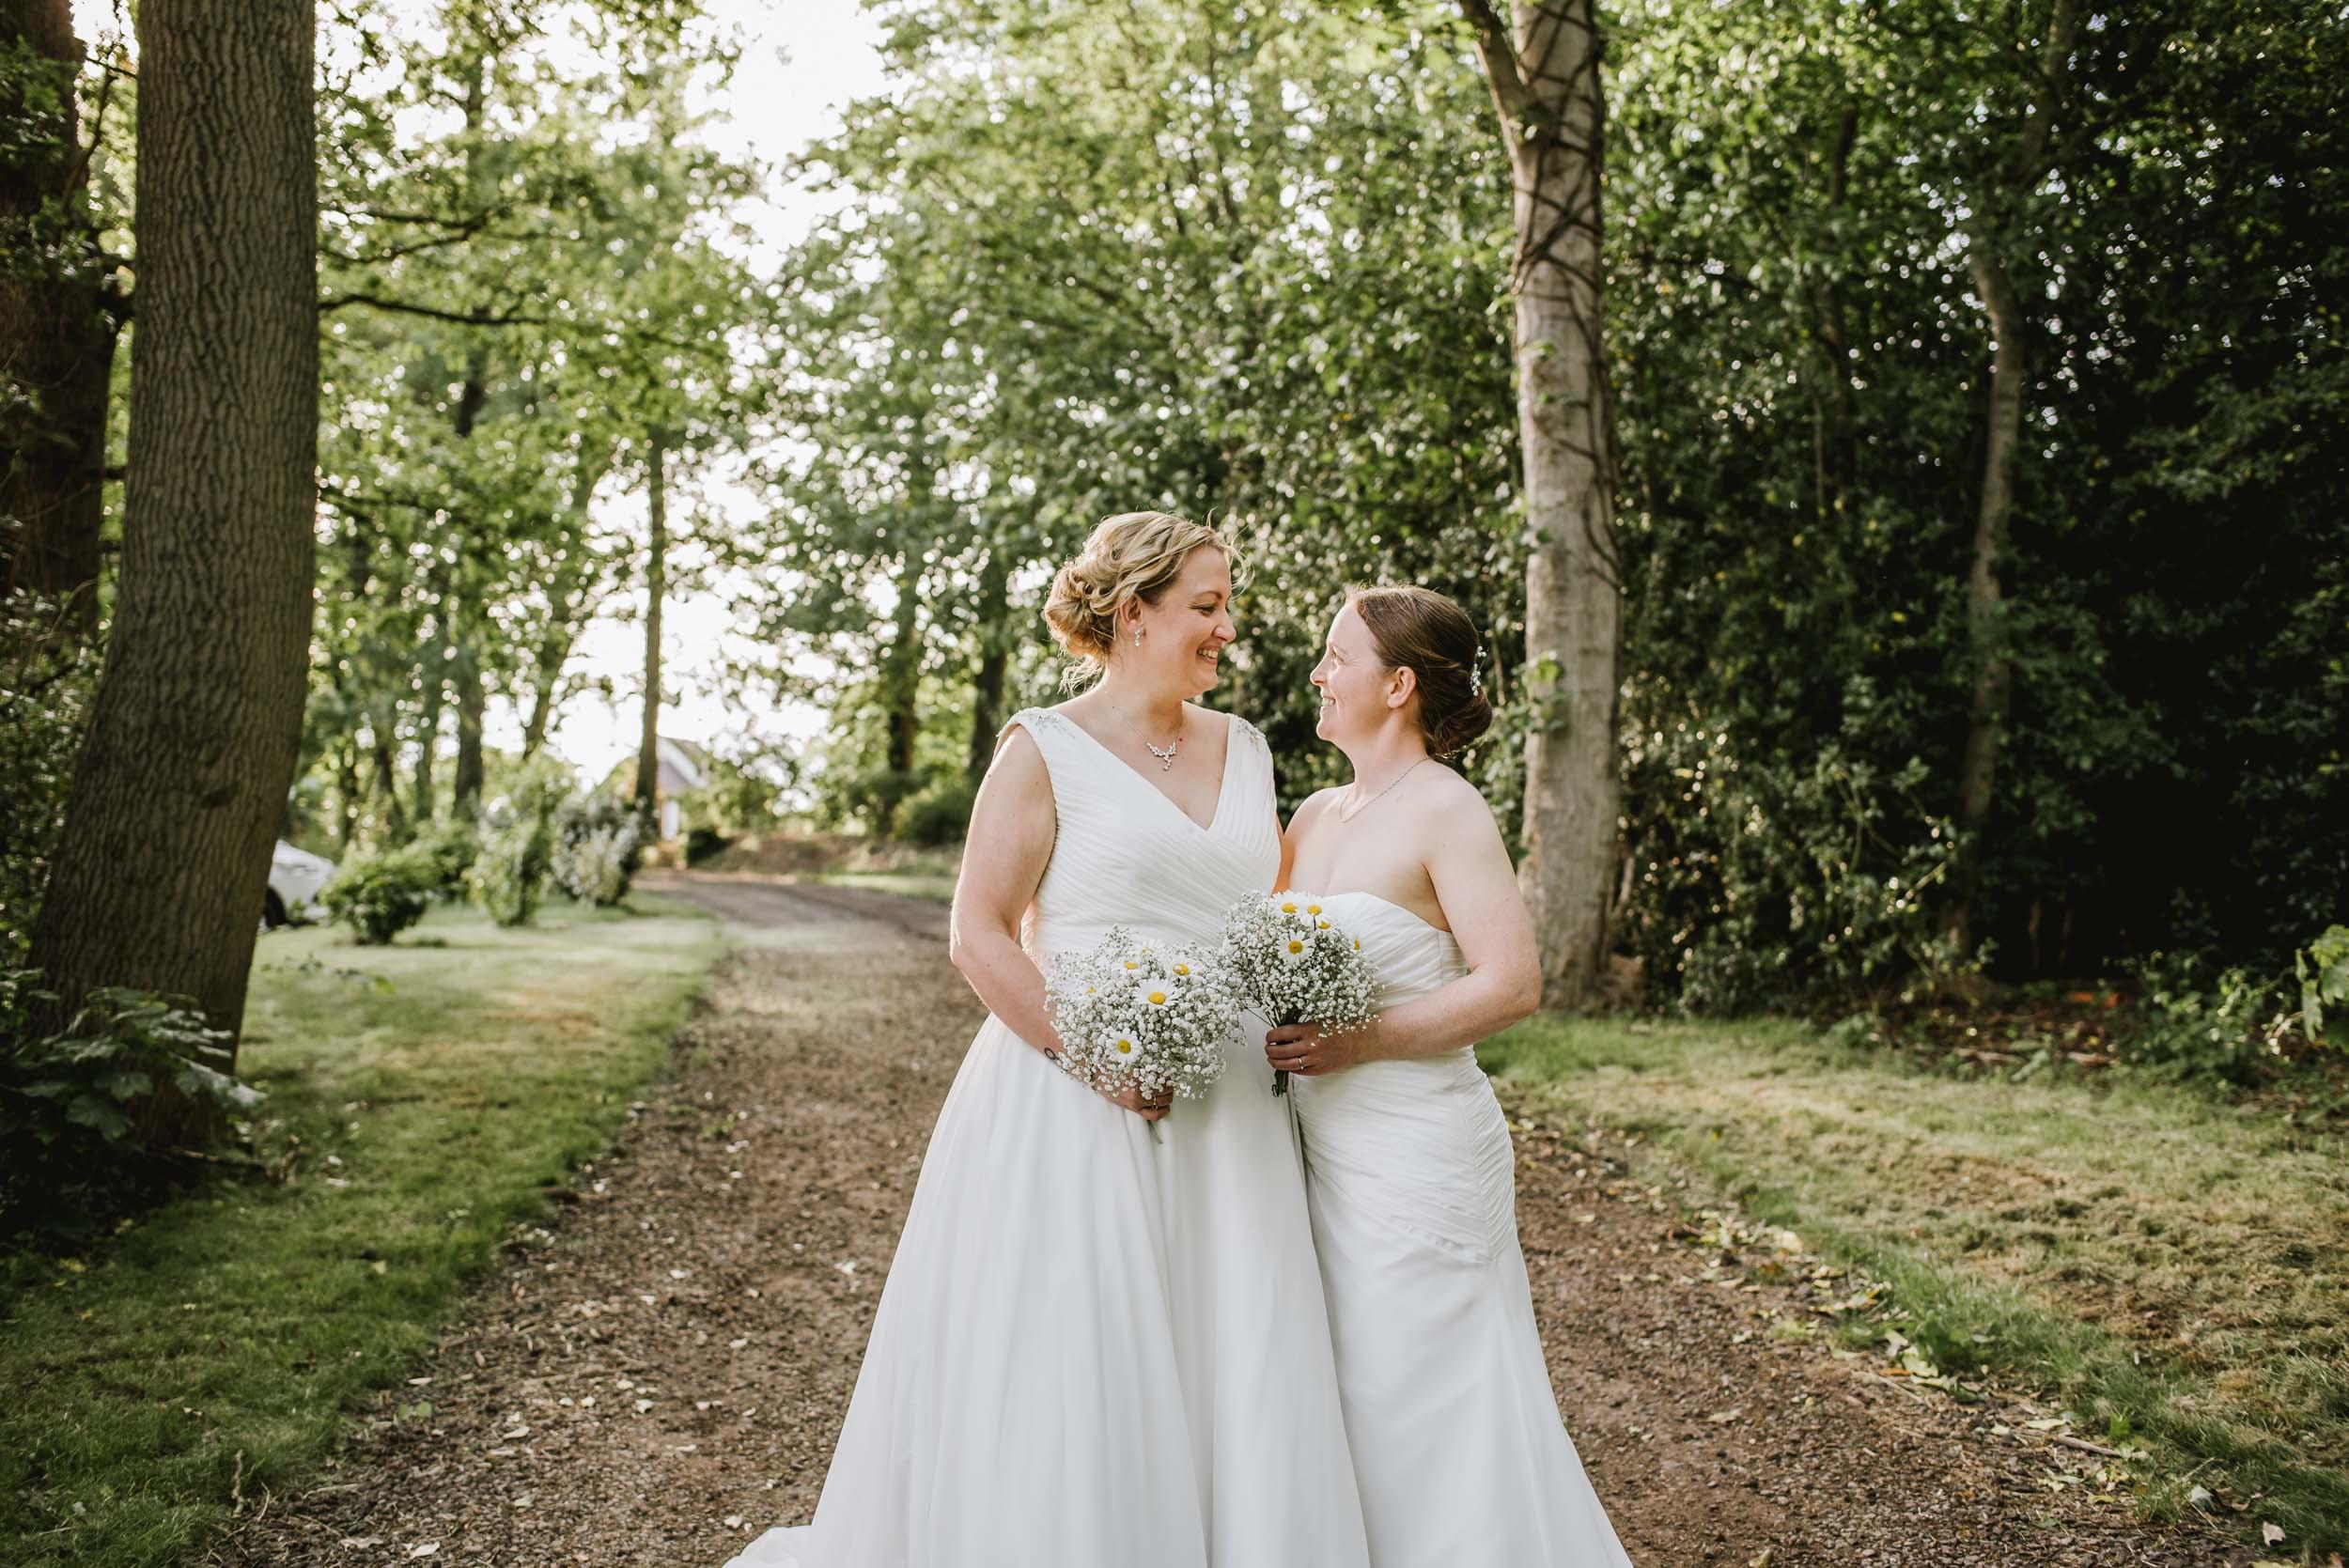 Donington-park-farm-wedding-photography-516.jpg